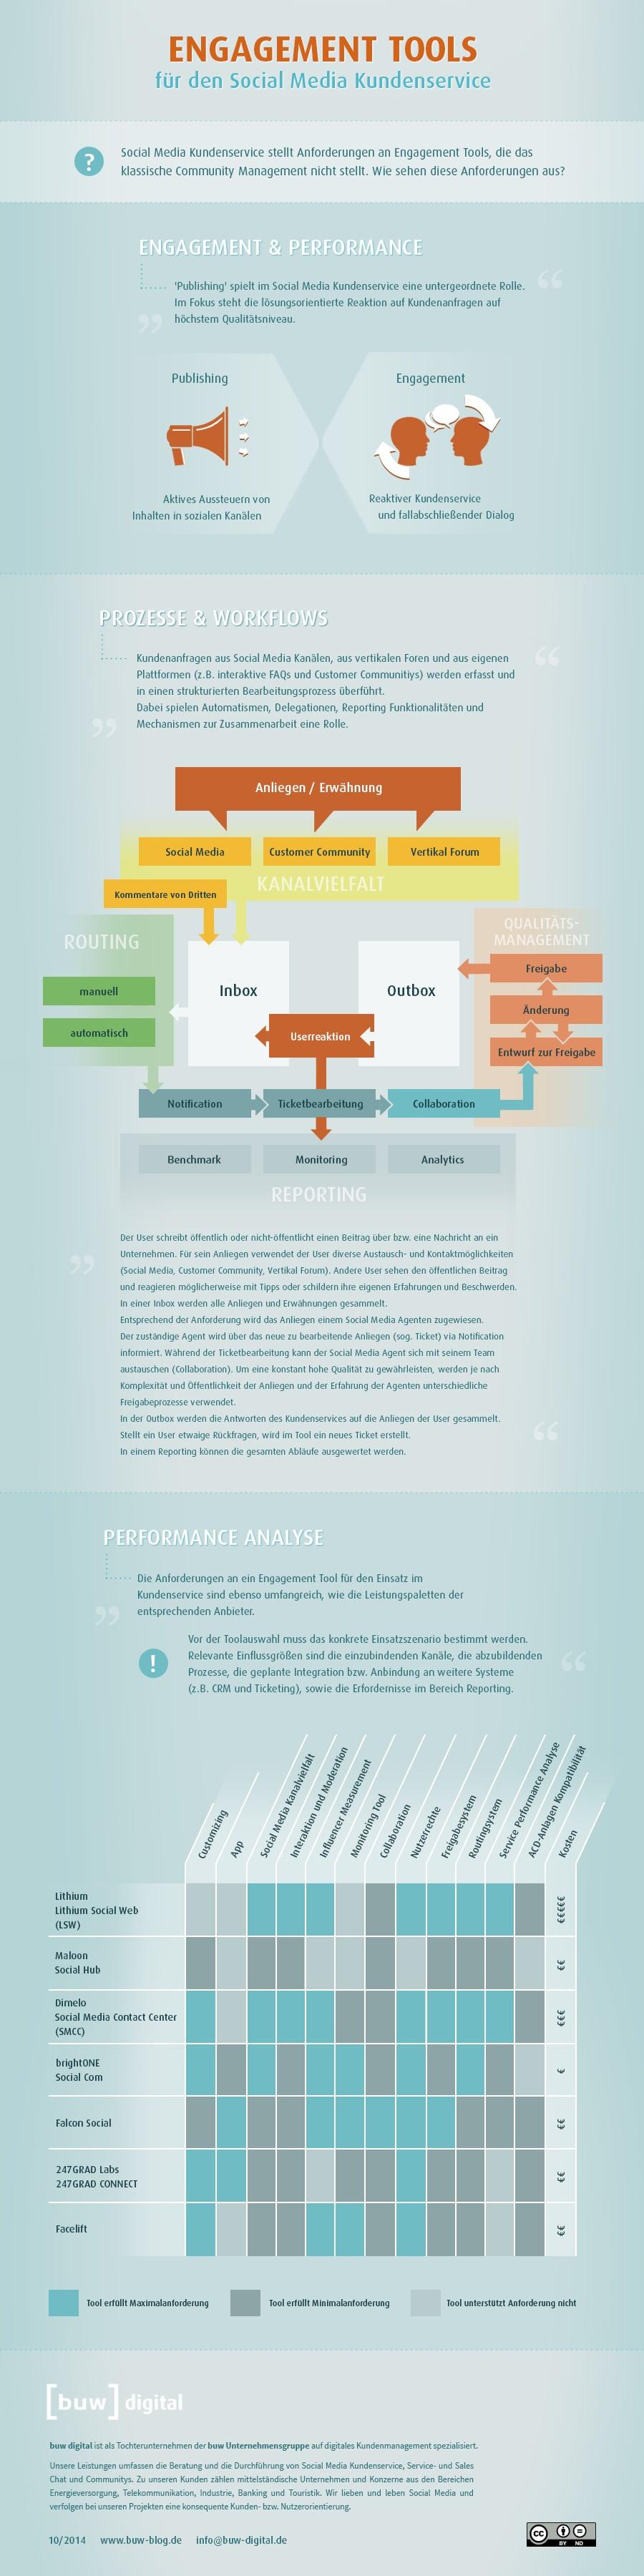 Engagement Tools für den Social Media Kundenservice